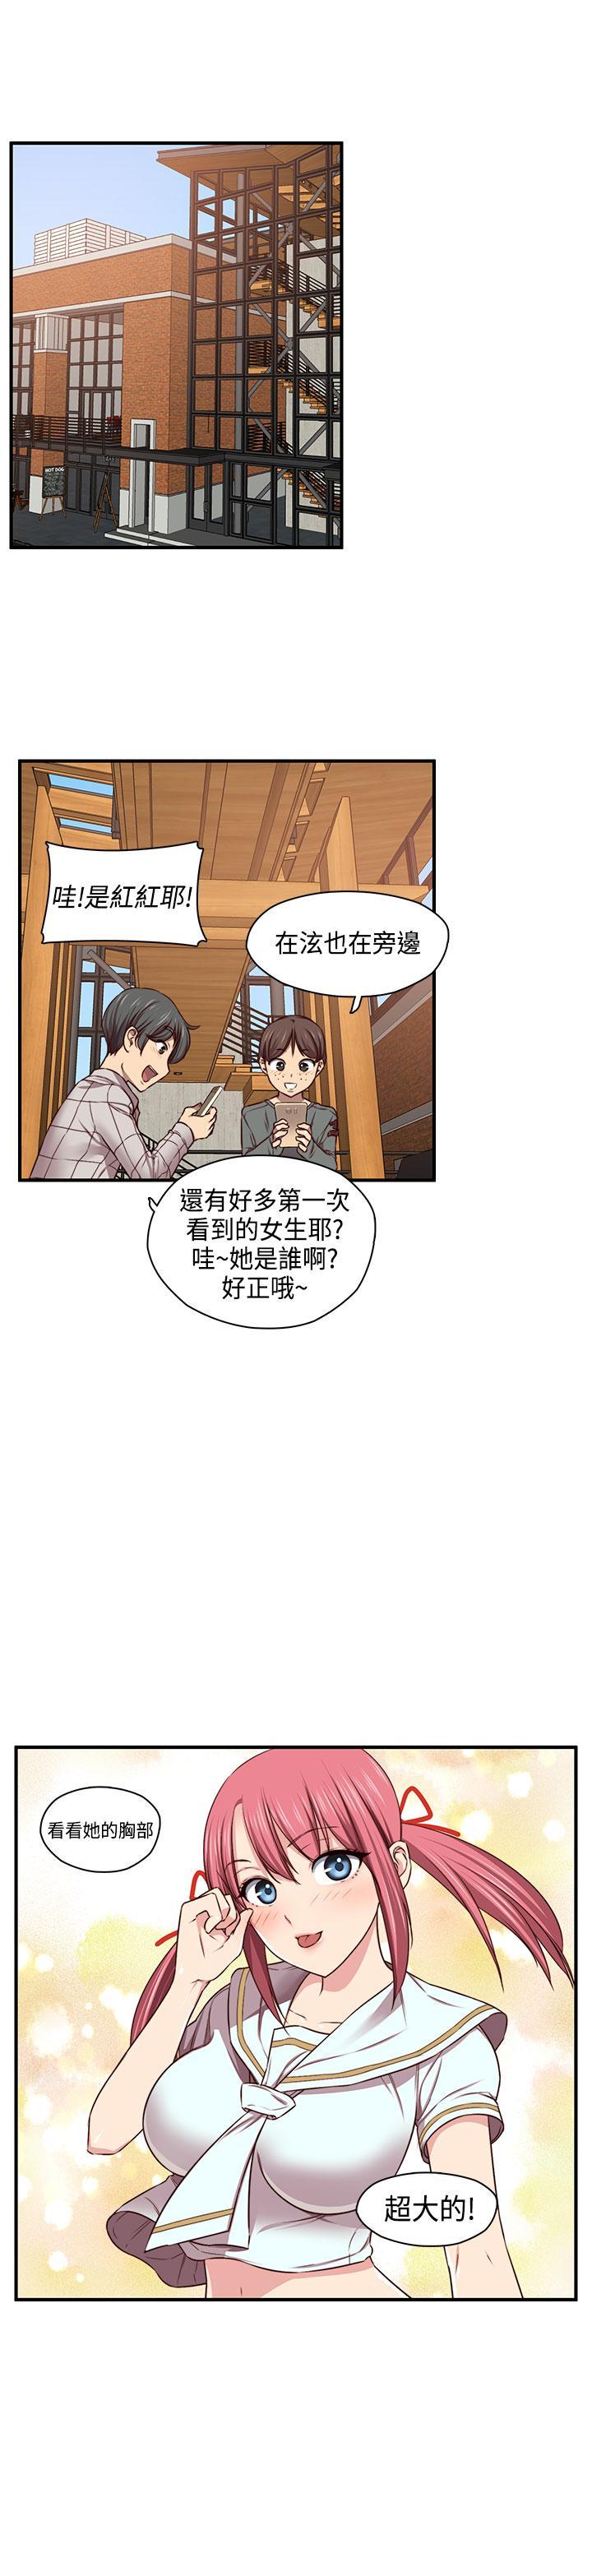 [Dasum & Puutaro] H-Campus H校园<第2季> ch.41-46 (chinese) 136